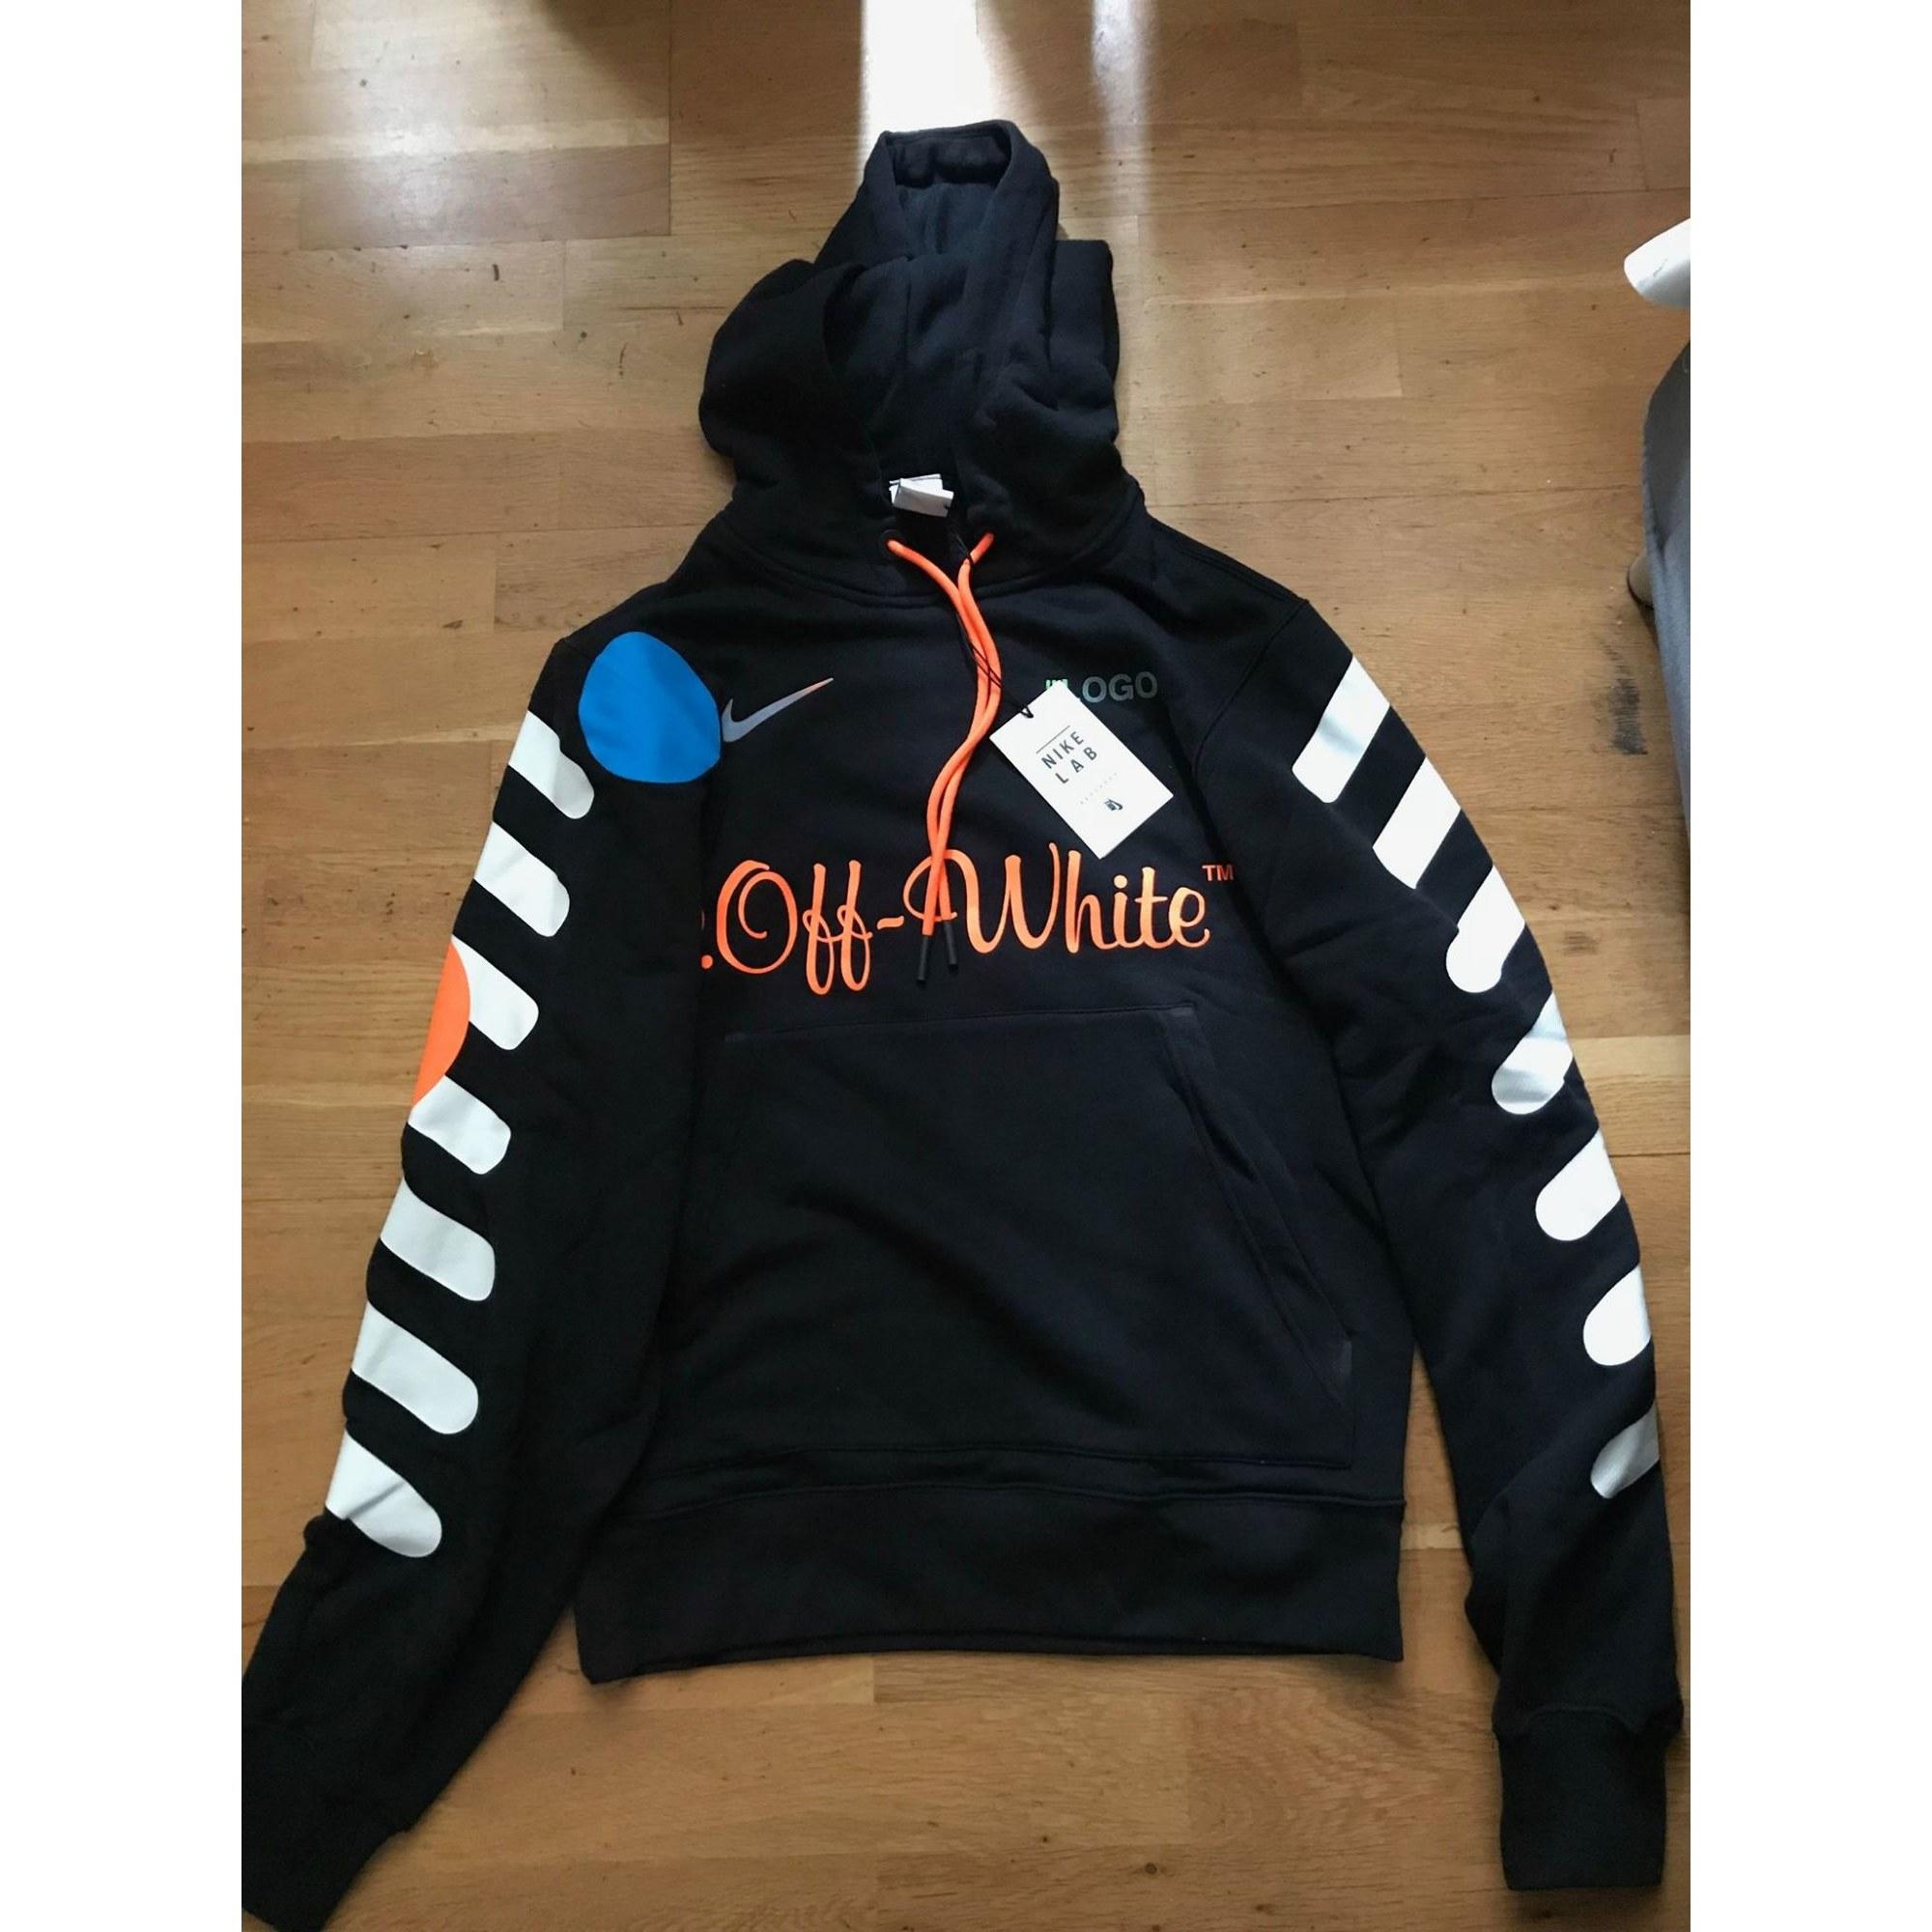 White xs Noir 0 Off 7887131 Sweat X Nike tvzq4FA